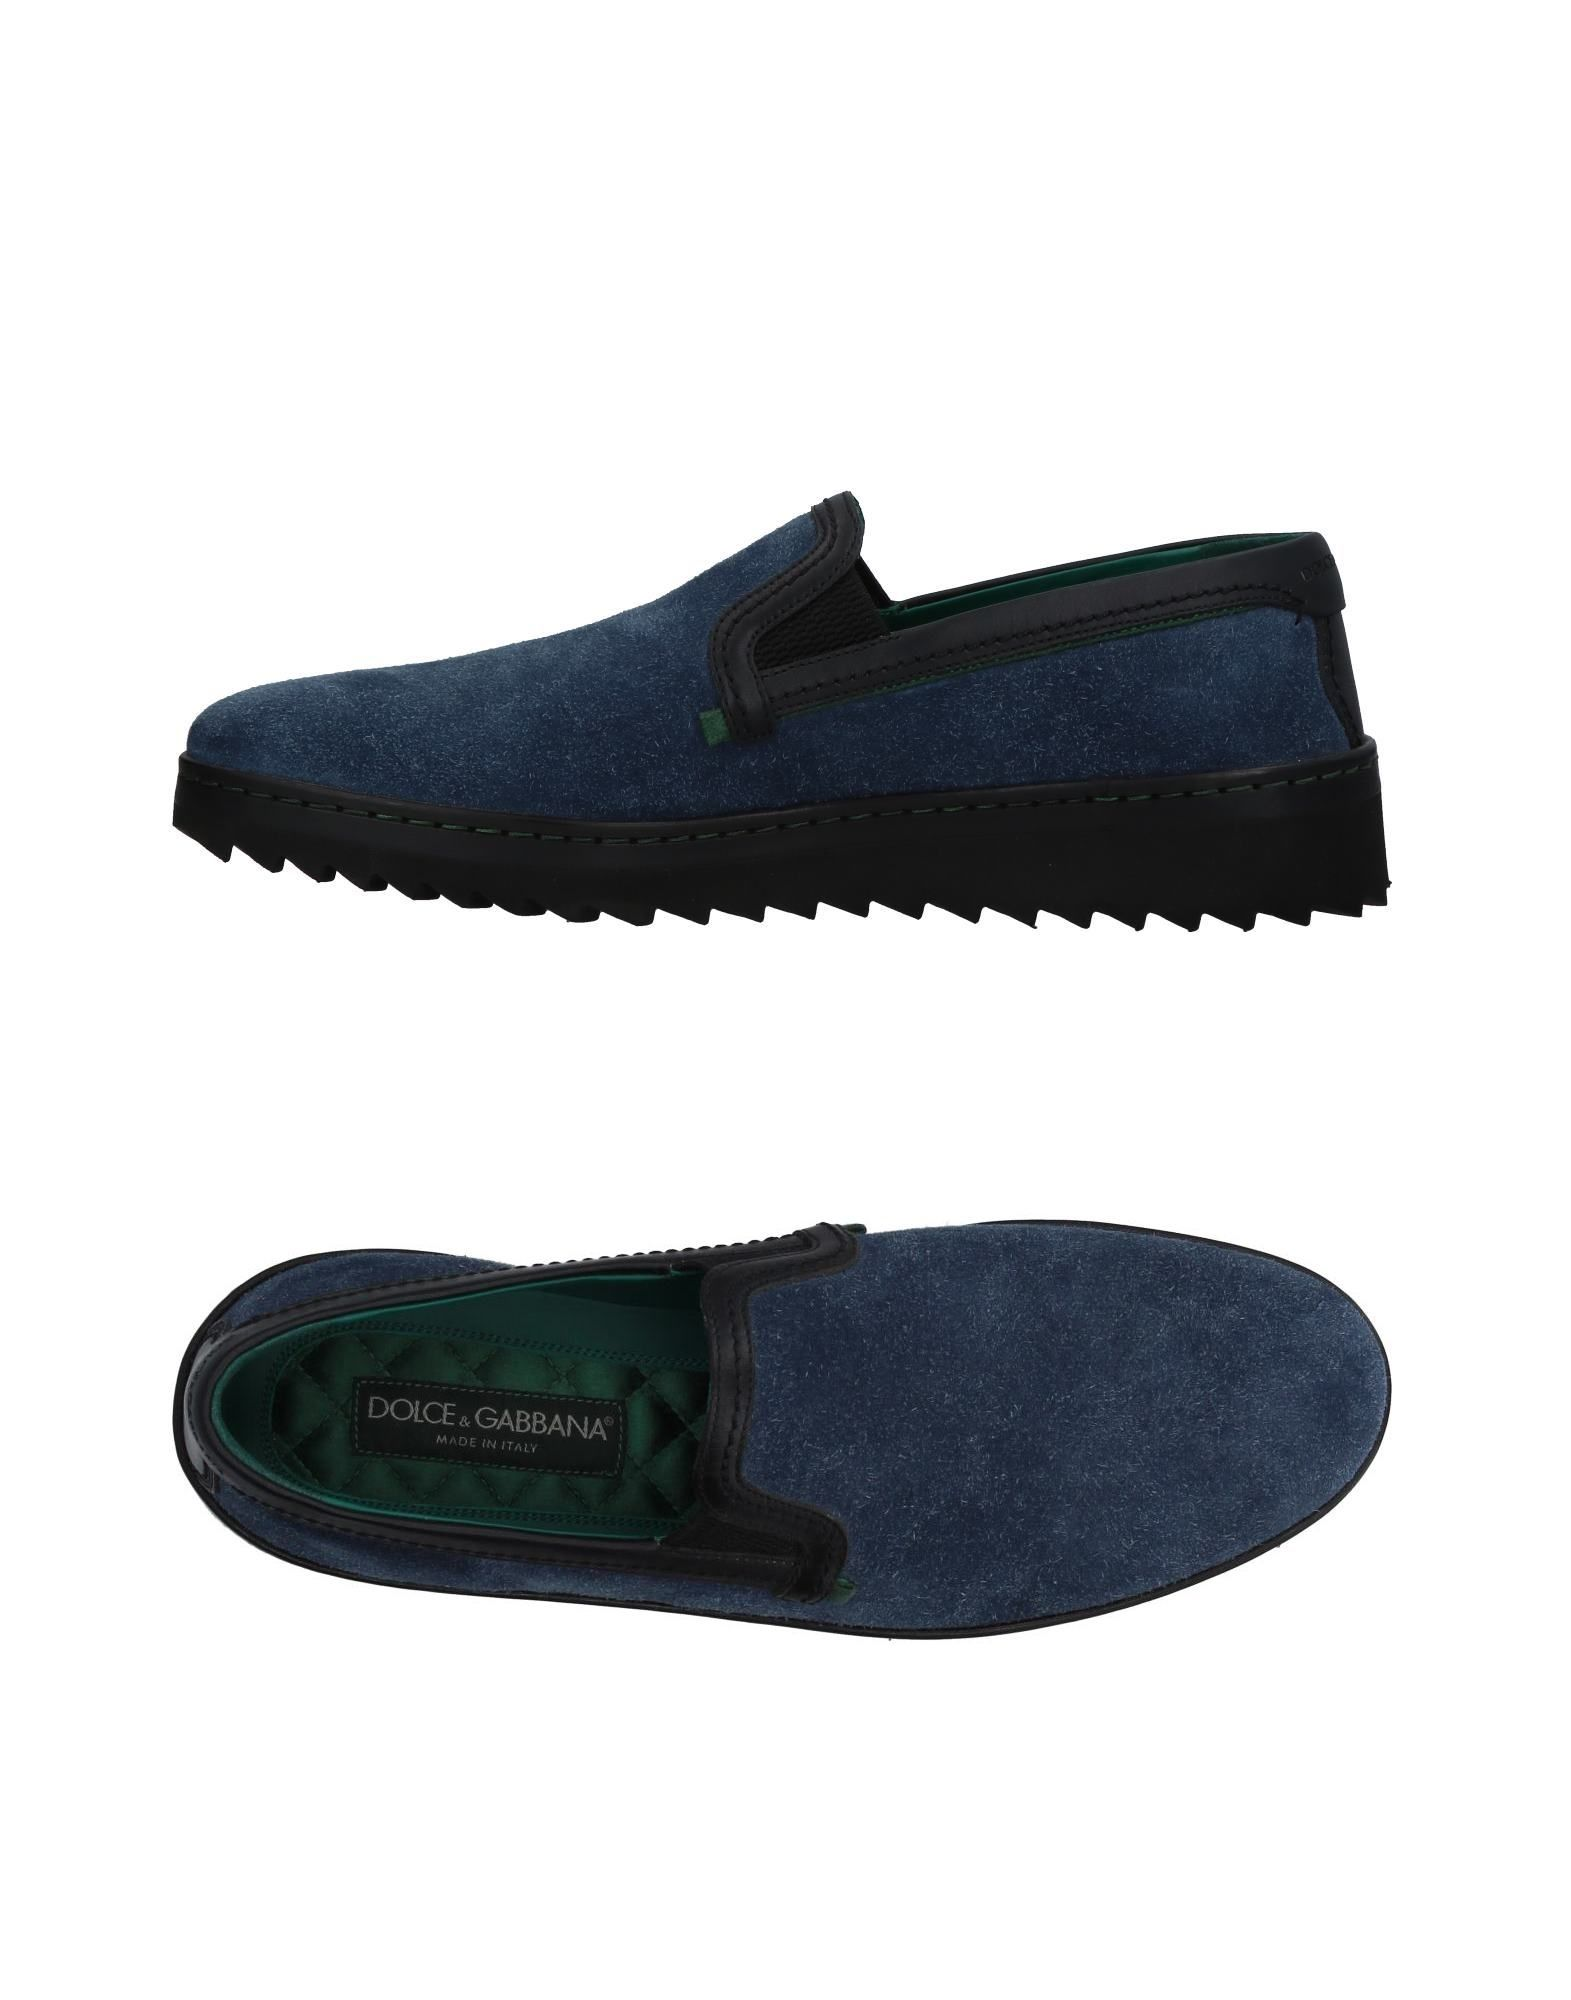 Dolce & Gabbana Sneakers Herren  11409828HT Gute Qualität beliebte Schuhe